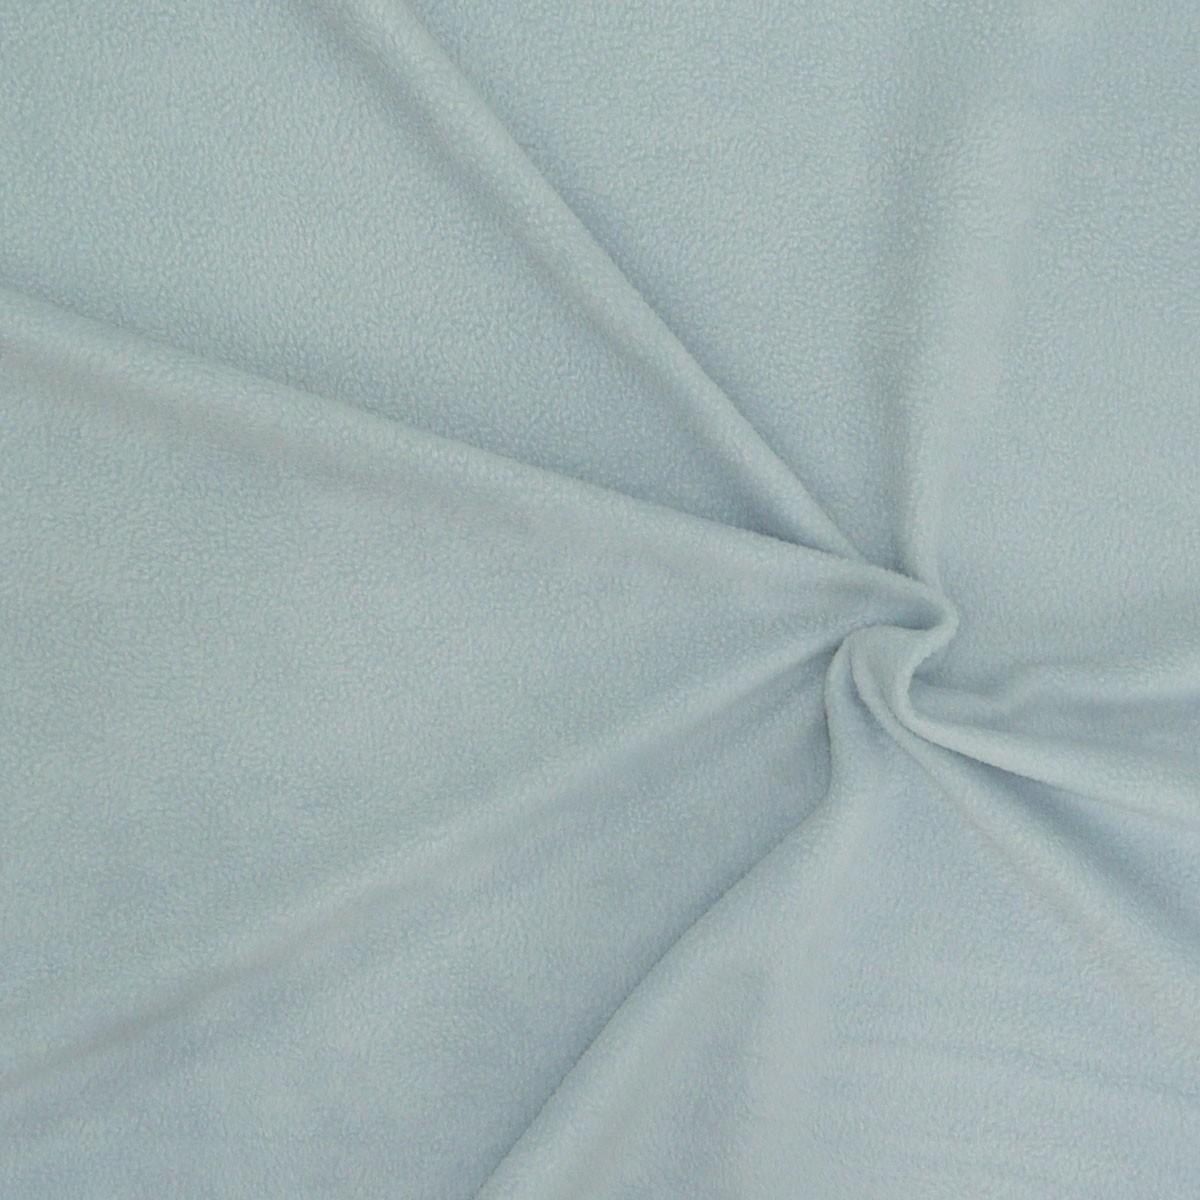 polar fleece stoffe fleecestoff hellblau babyblau alle stoffe stoffe uni fleece. Black Bedroom Furniture Sets. Home Design Ideas